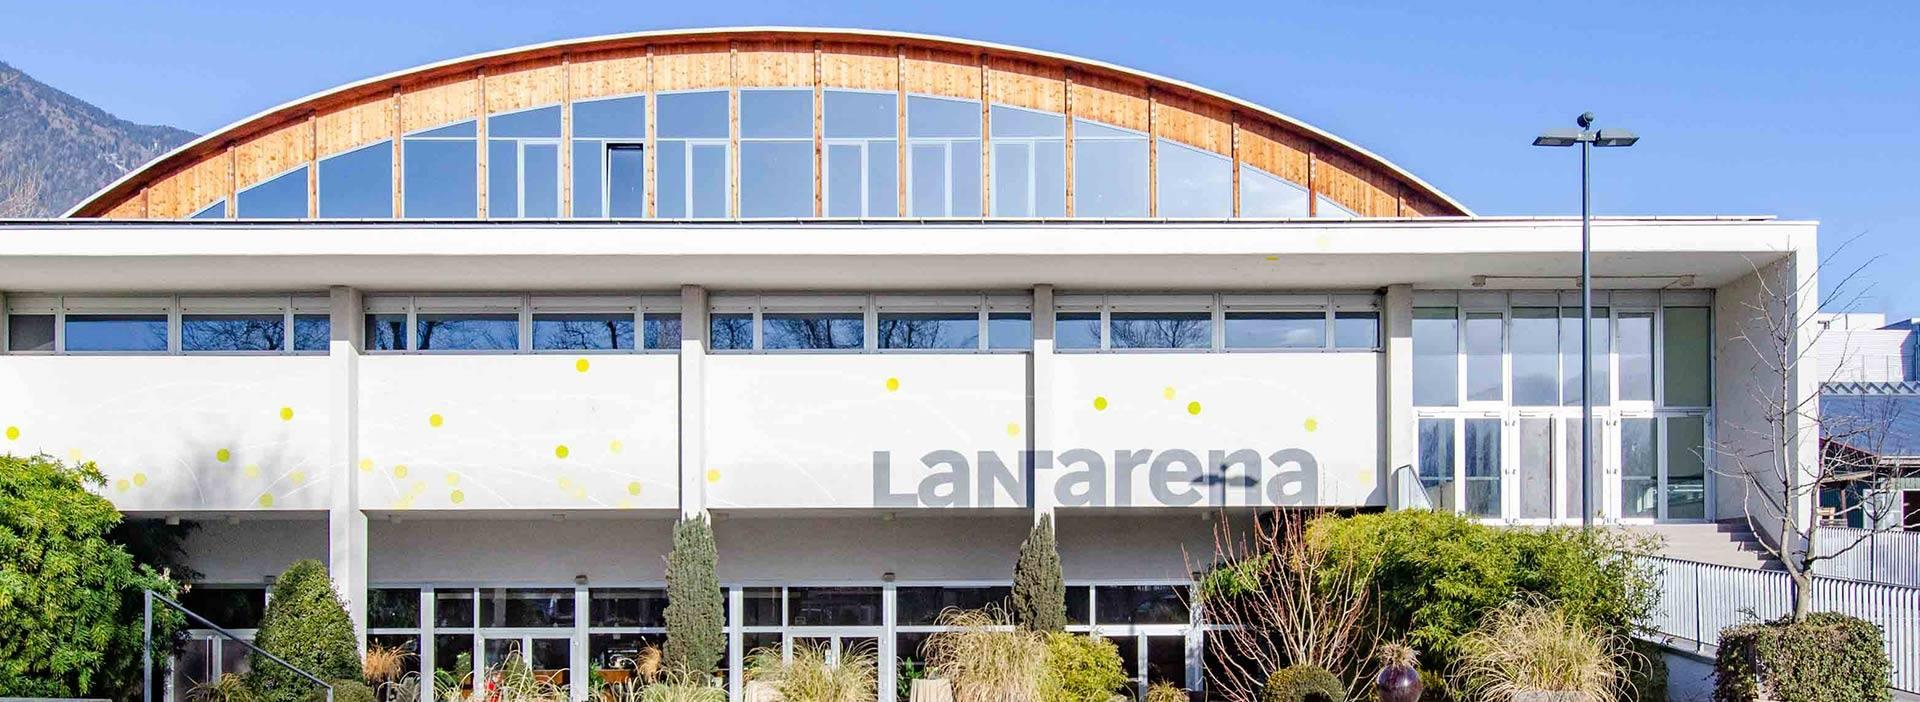 Lanarena